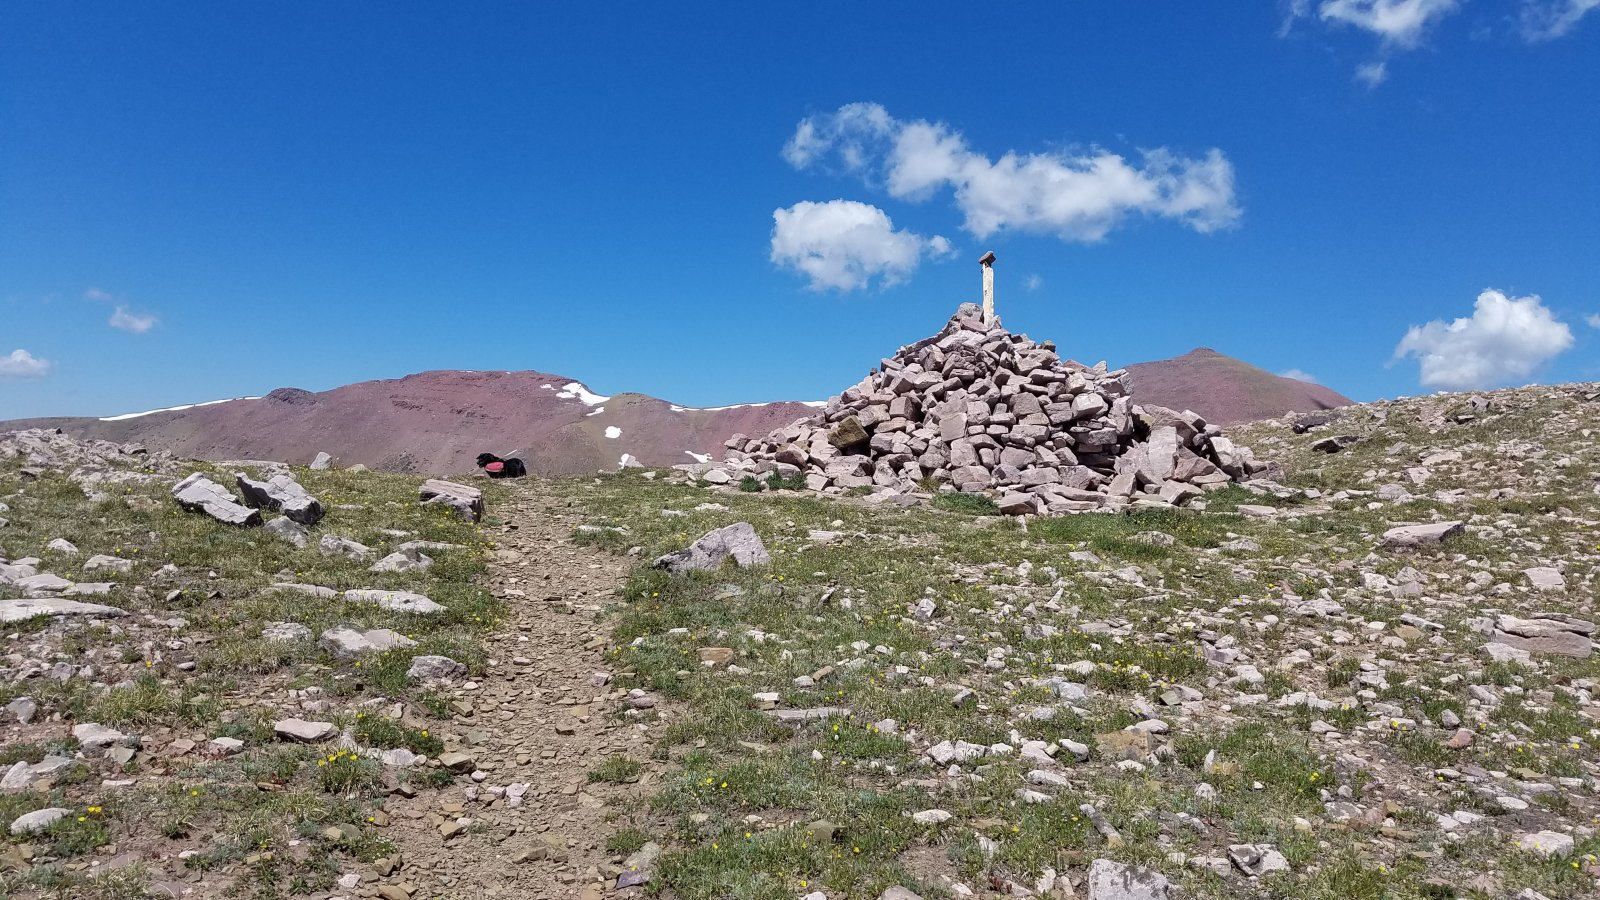 20200729_123105 Climbing Porcupine Pass.jpg